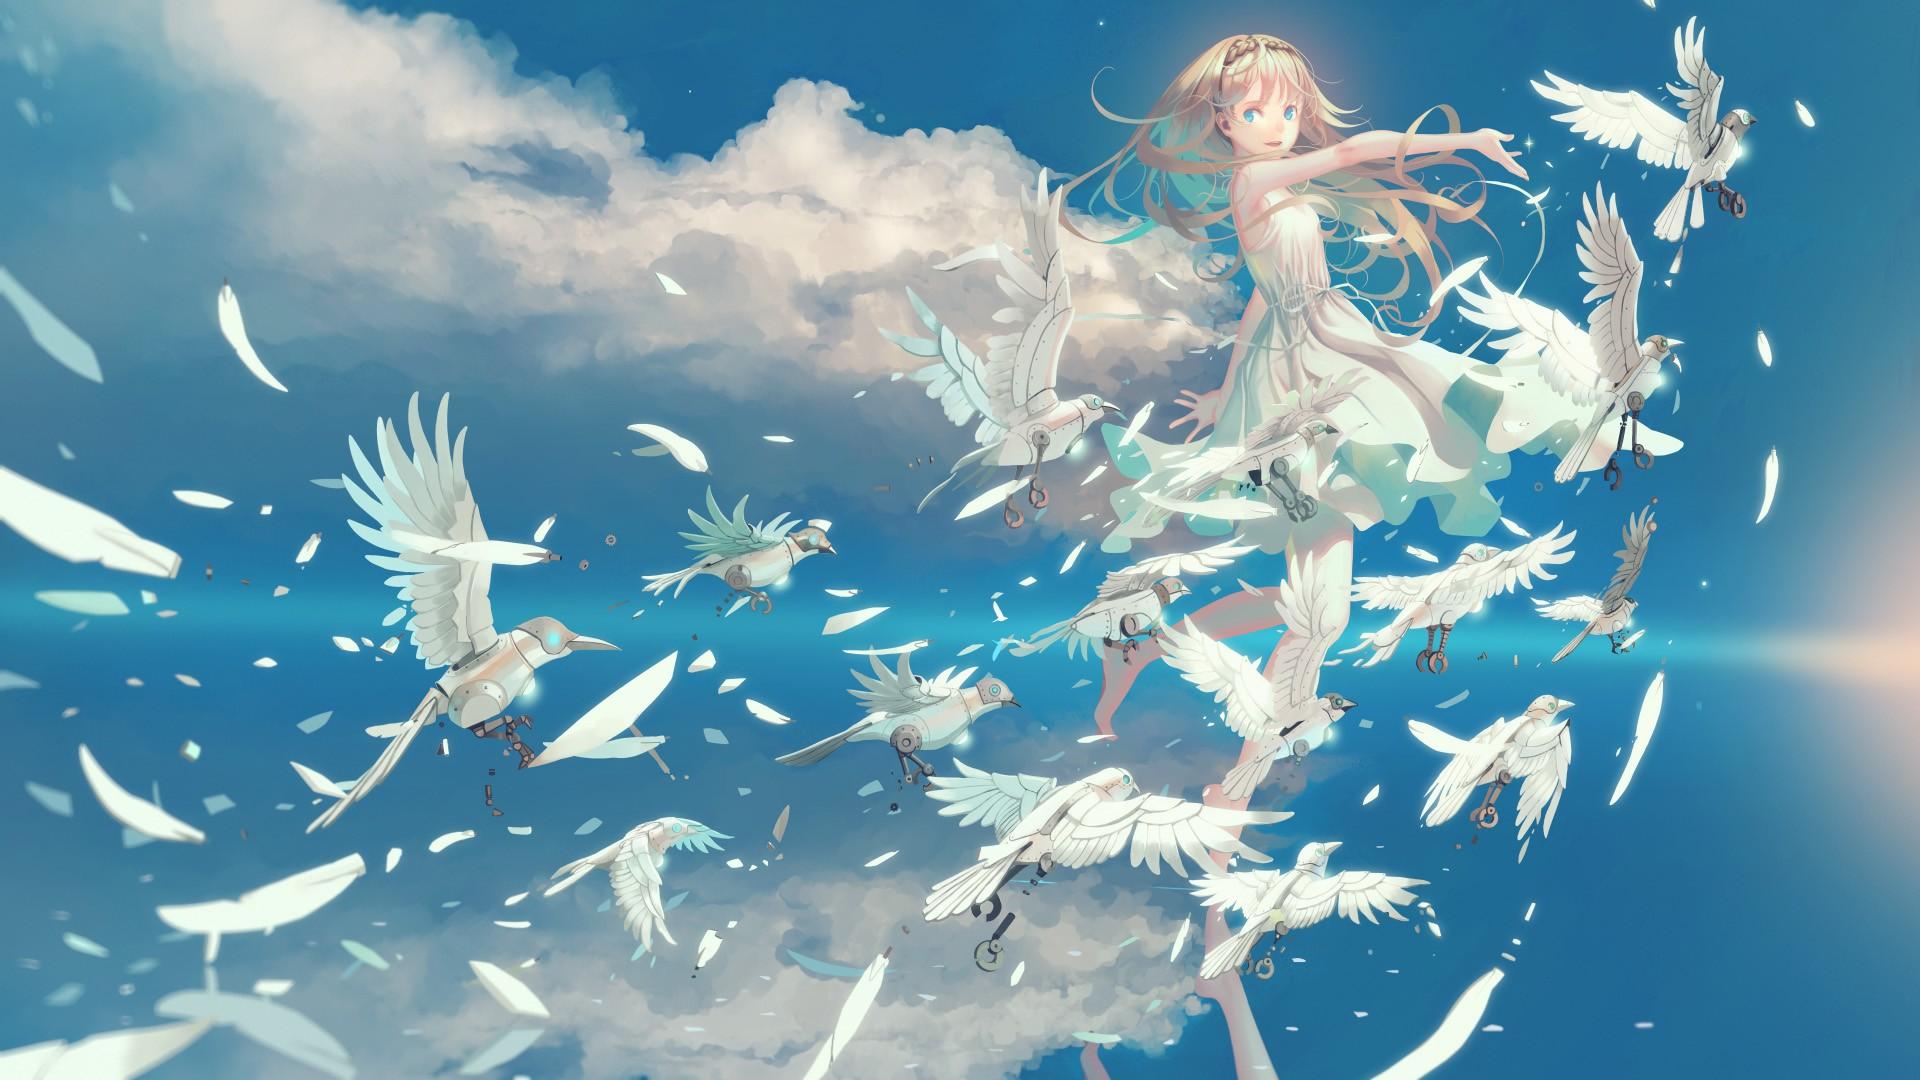 Anime Cloud computer wallpaper